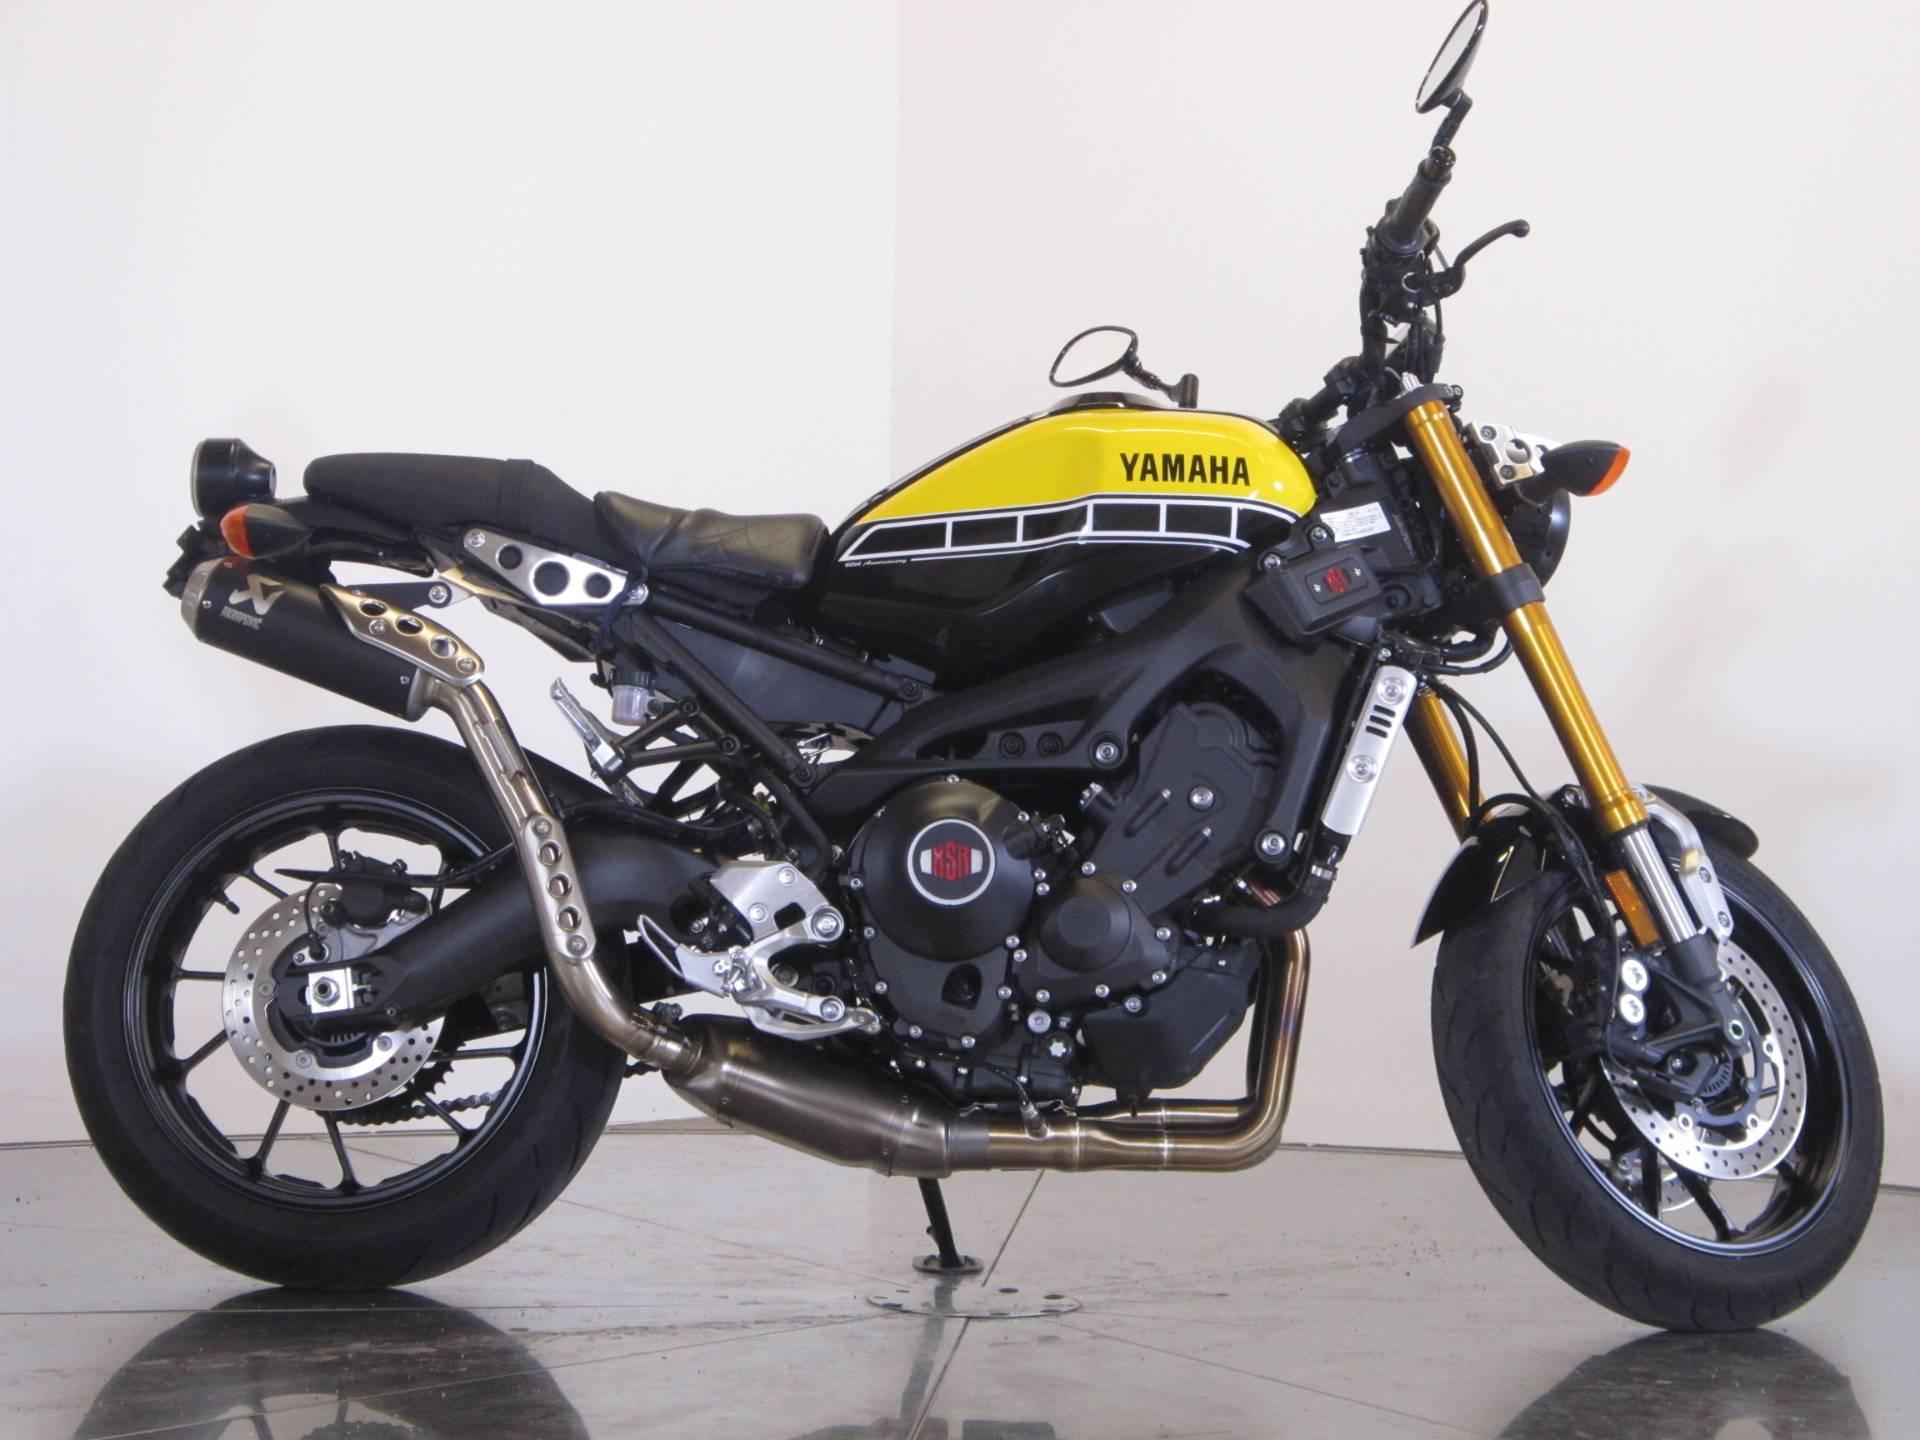 2016 Yamaha XSR900 for sale 113726